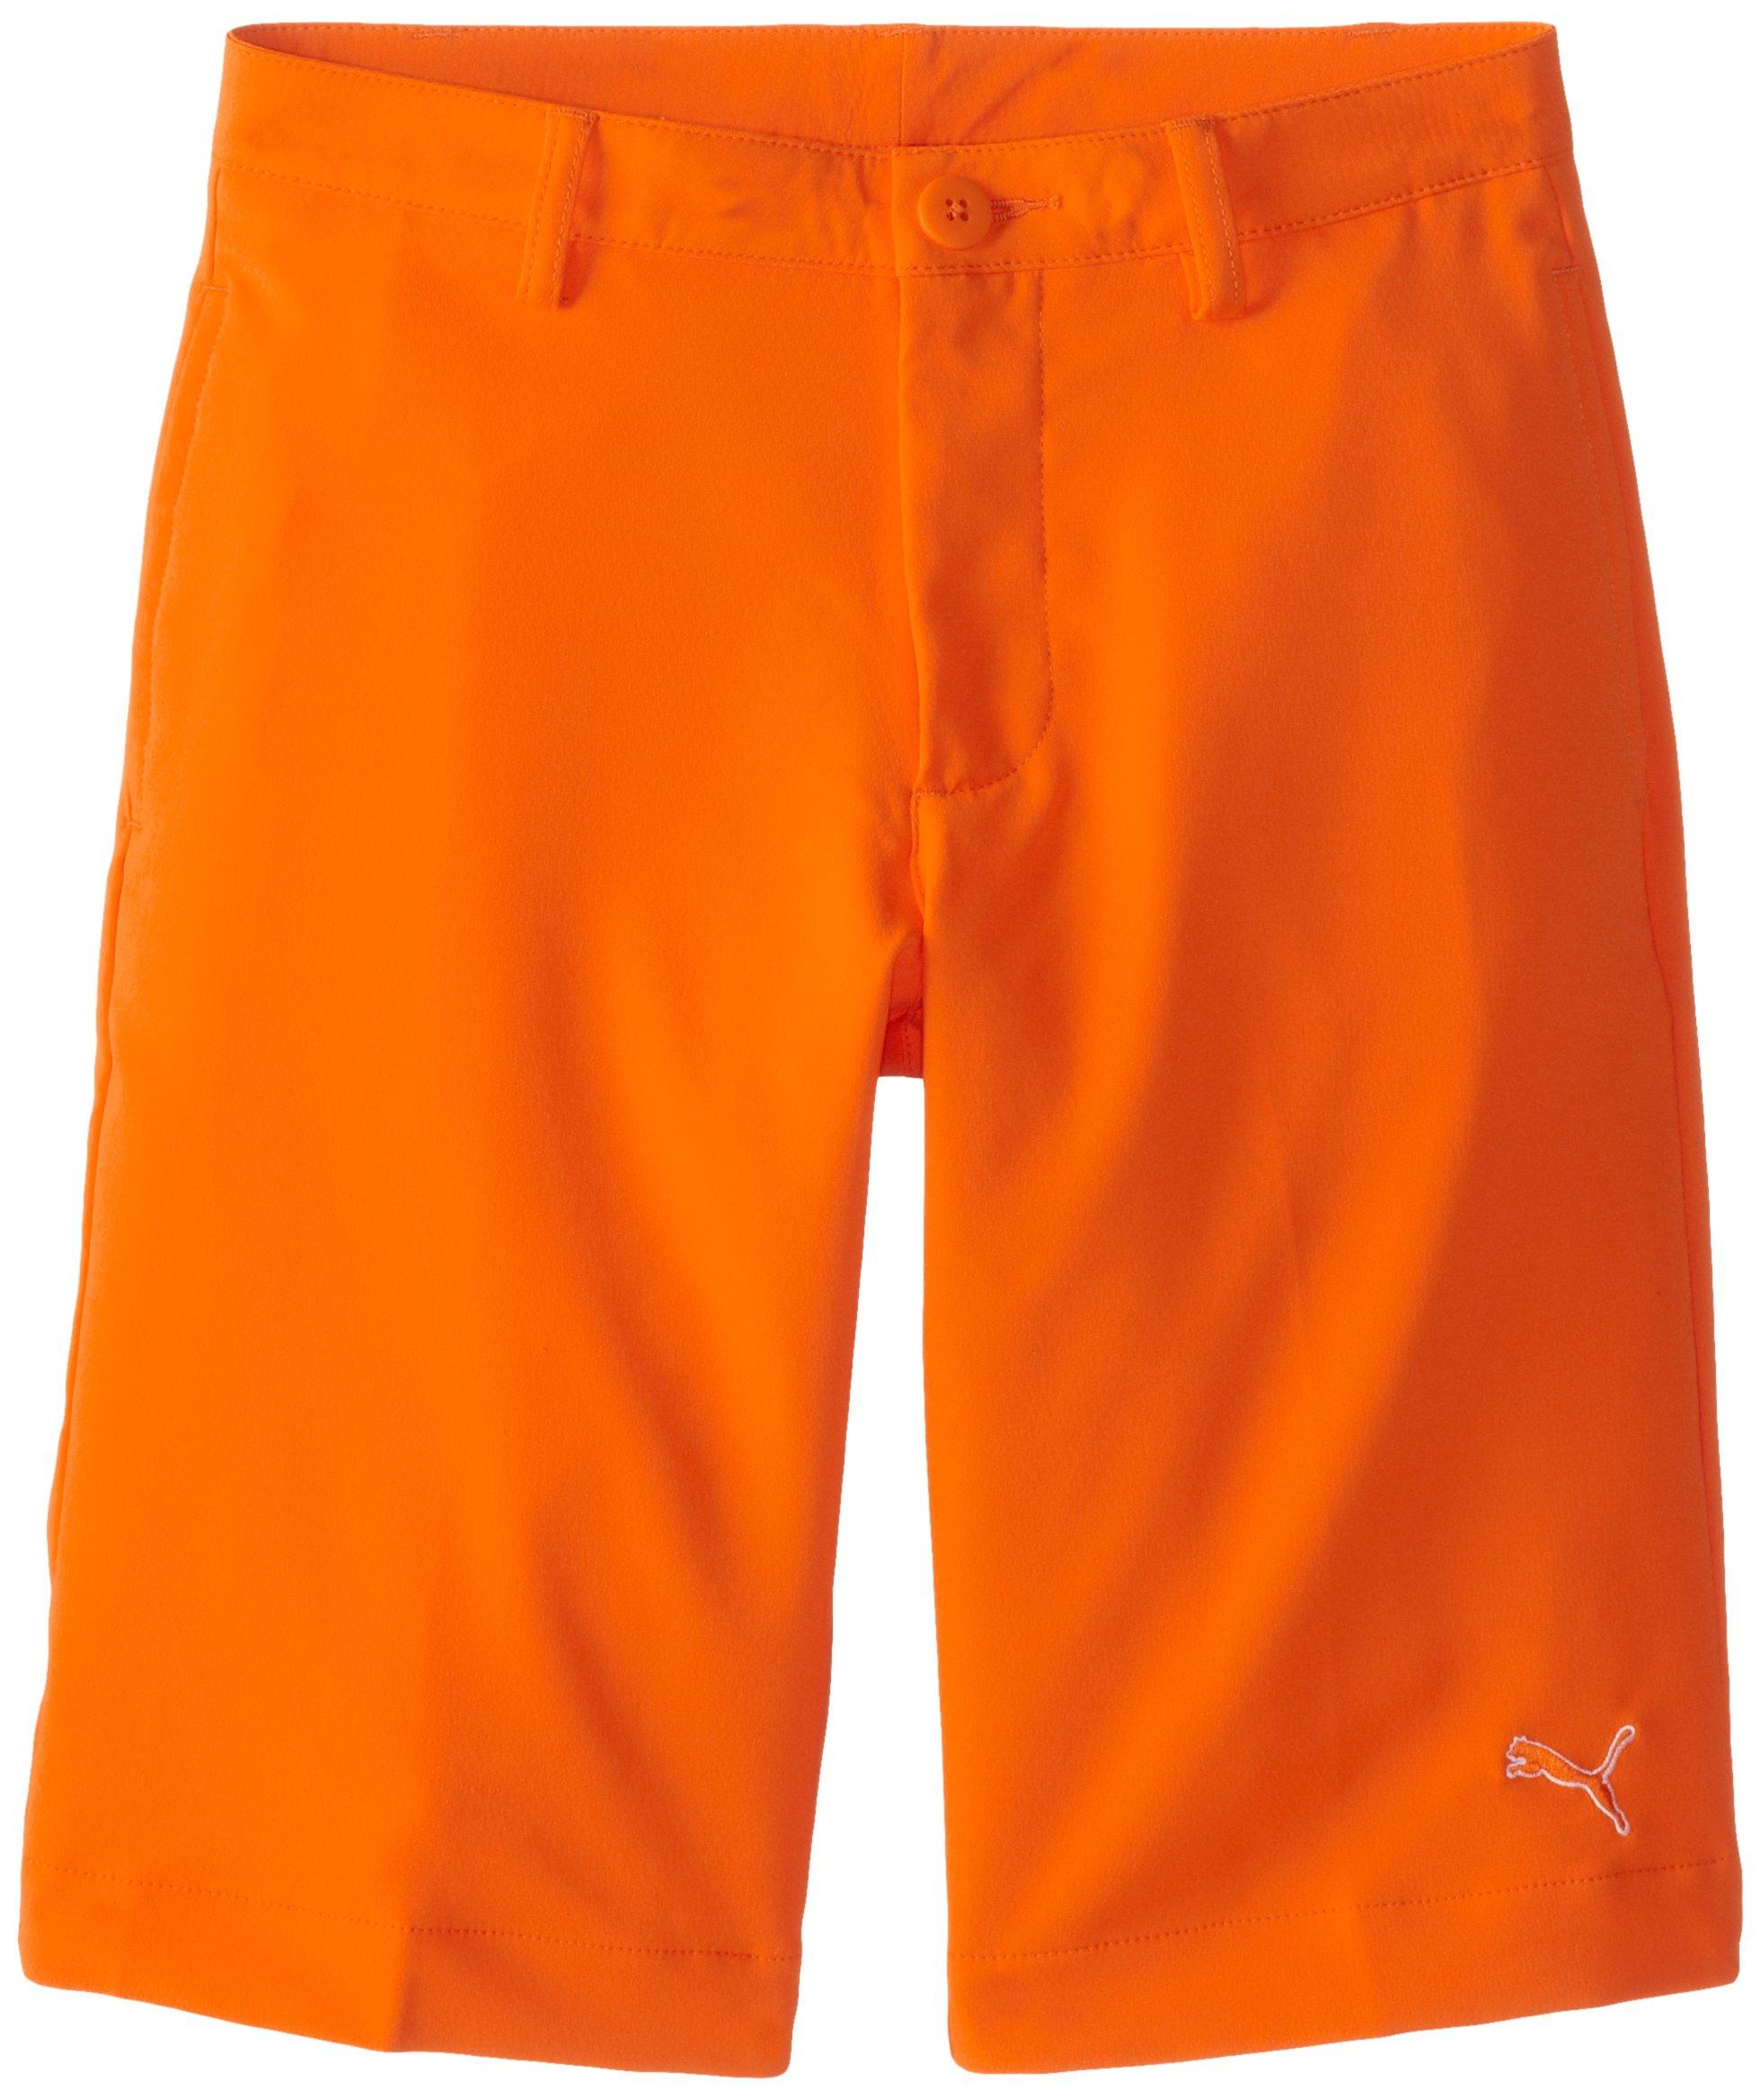 Puma Golf Boys Junior Tech Short, Vibrant Orange, Large